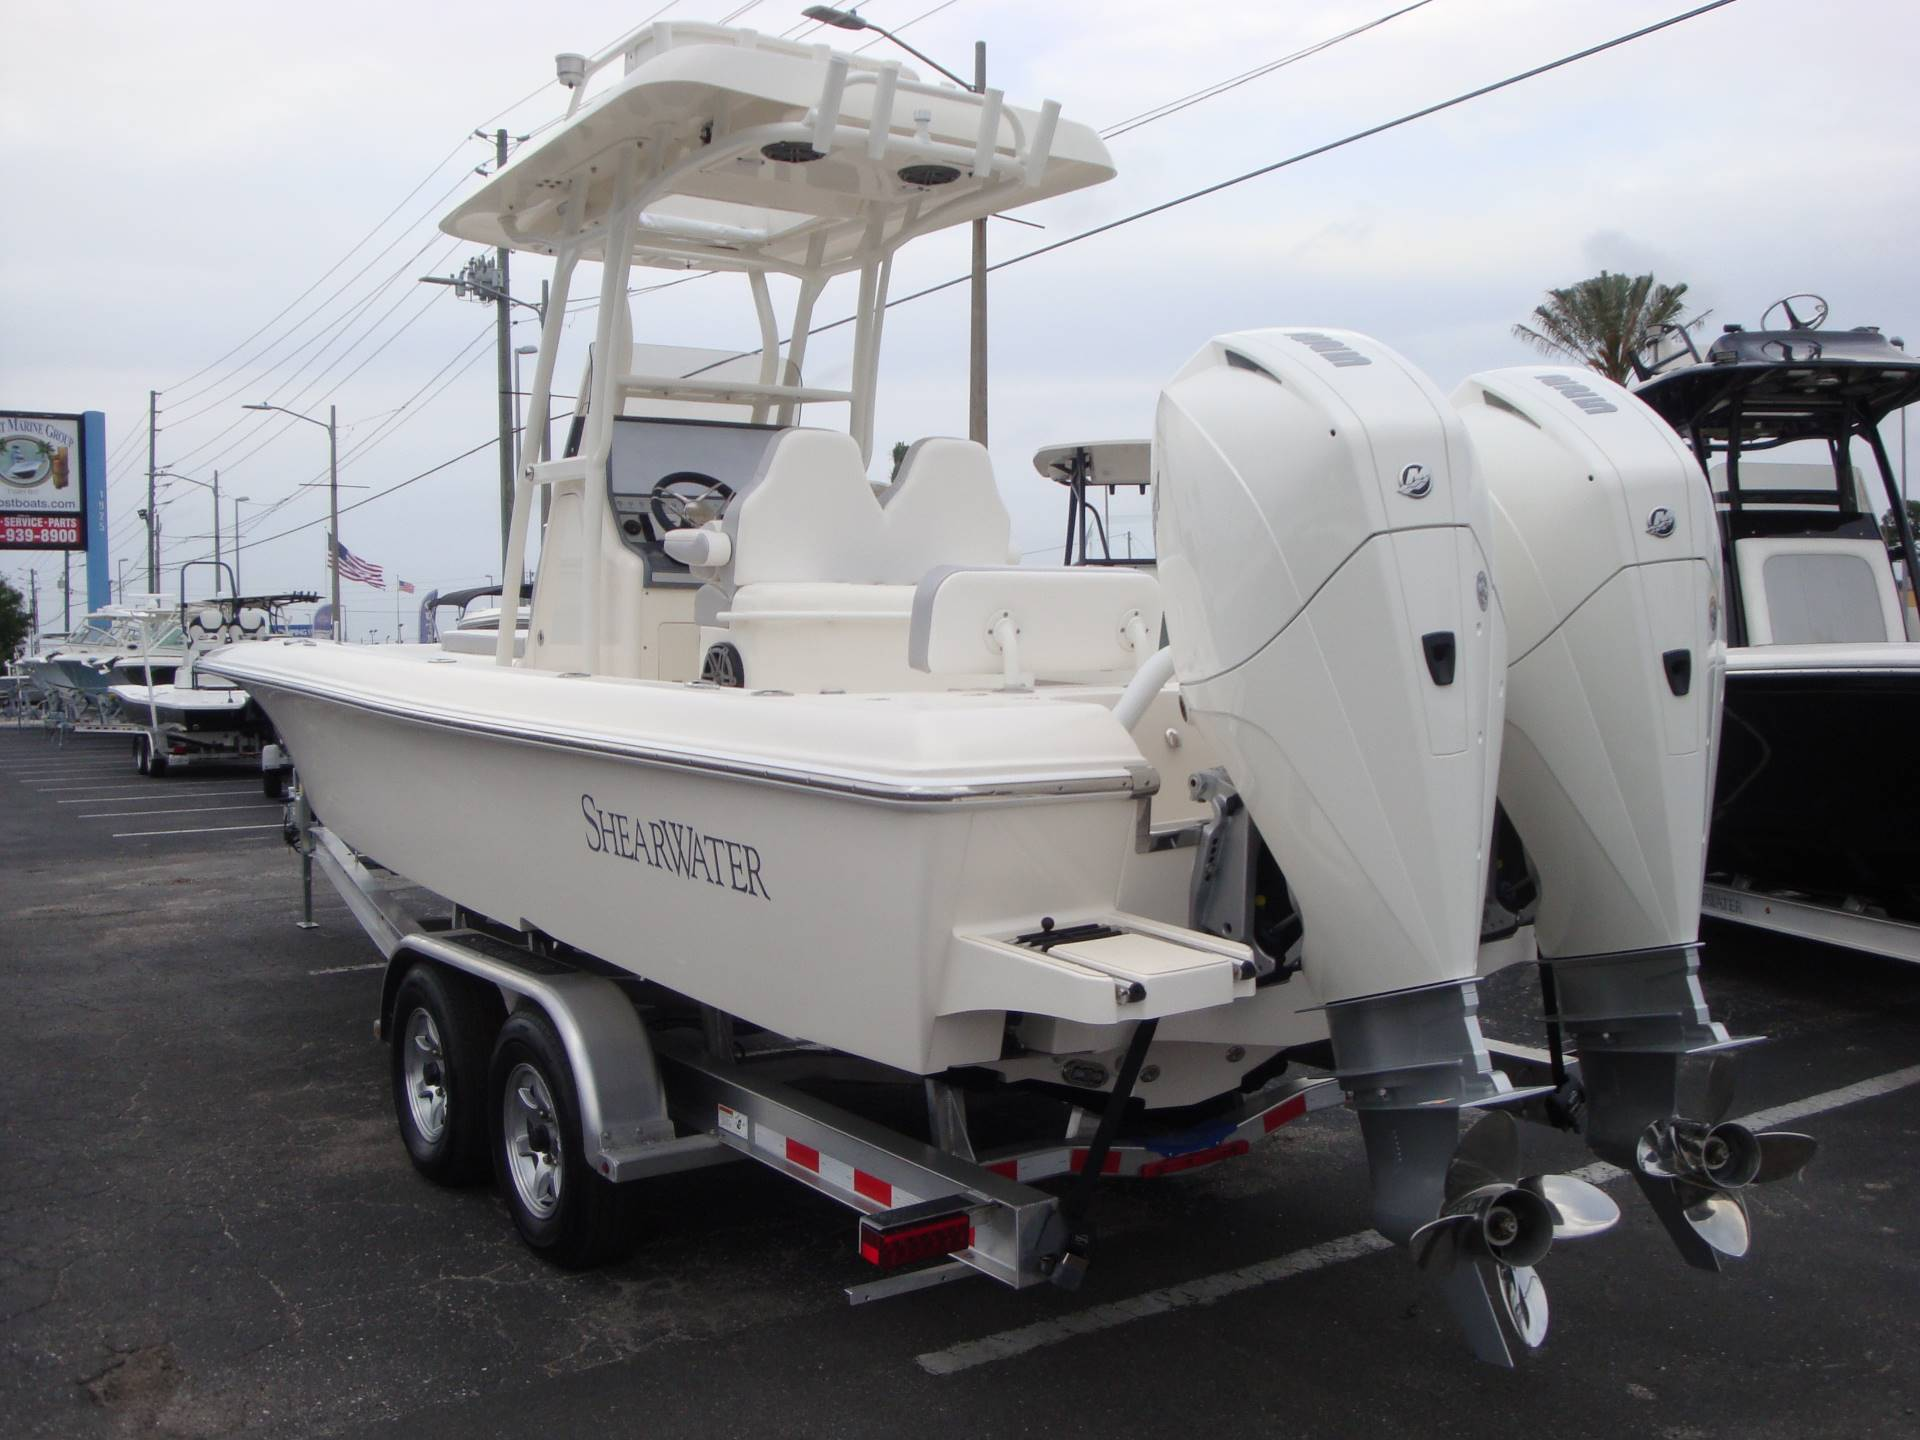 New 2019 ShearWater 270 Carolina Bay TE Power Boats Outboard